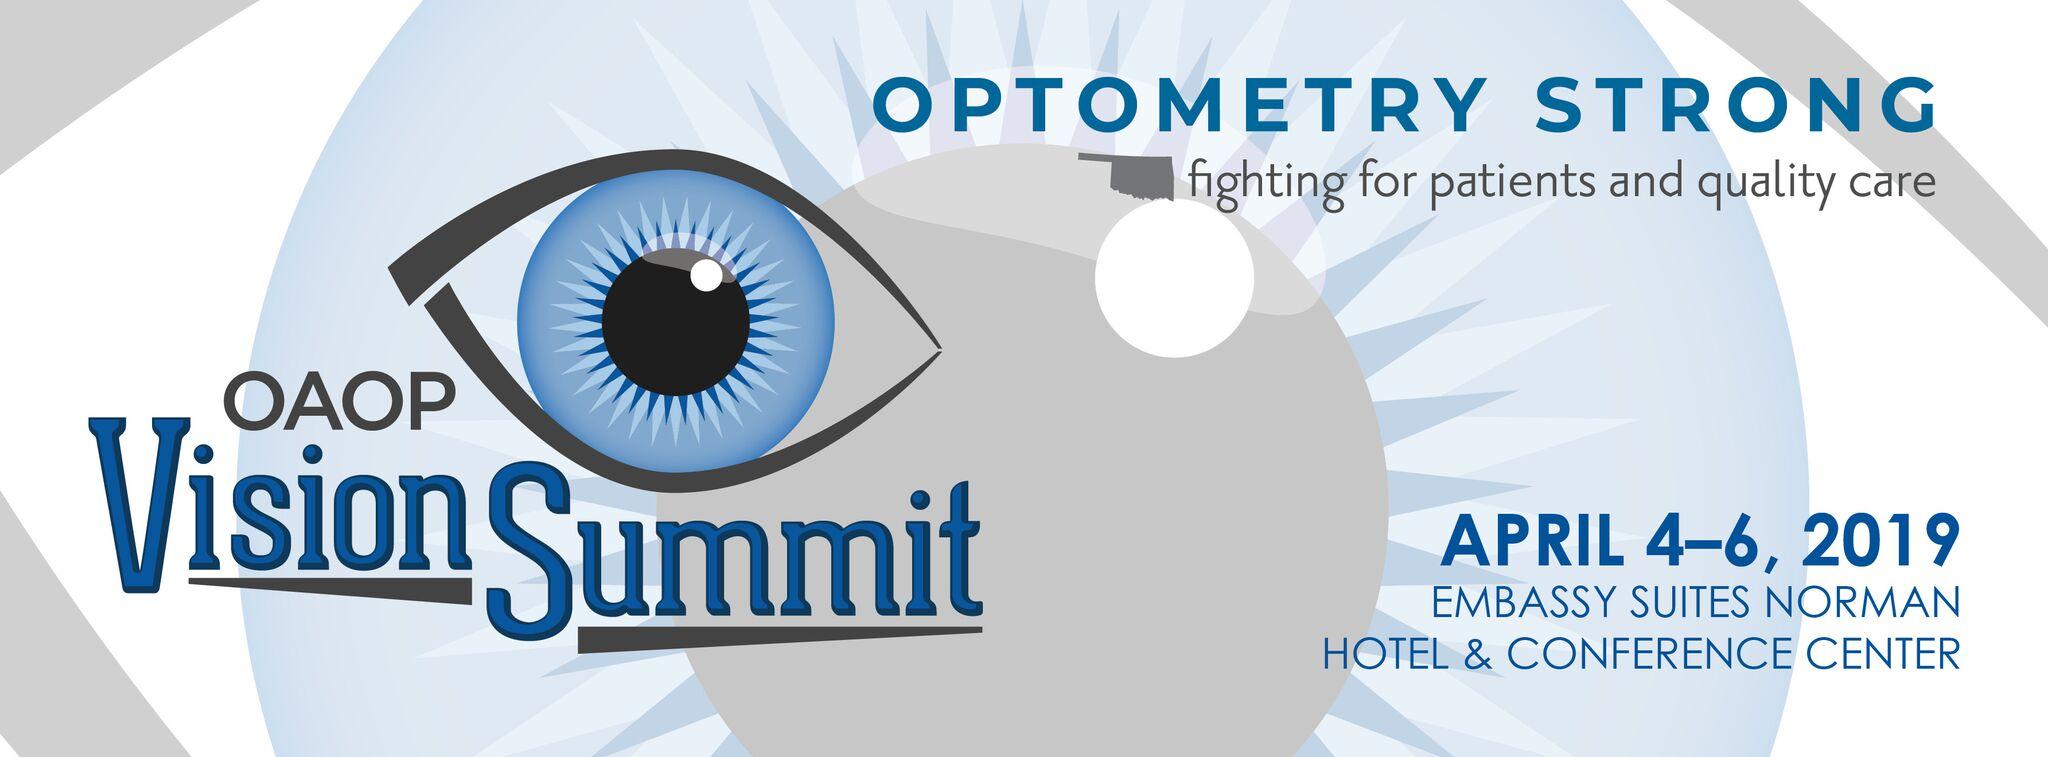 2019 OAOP Vision Summit